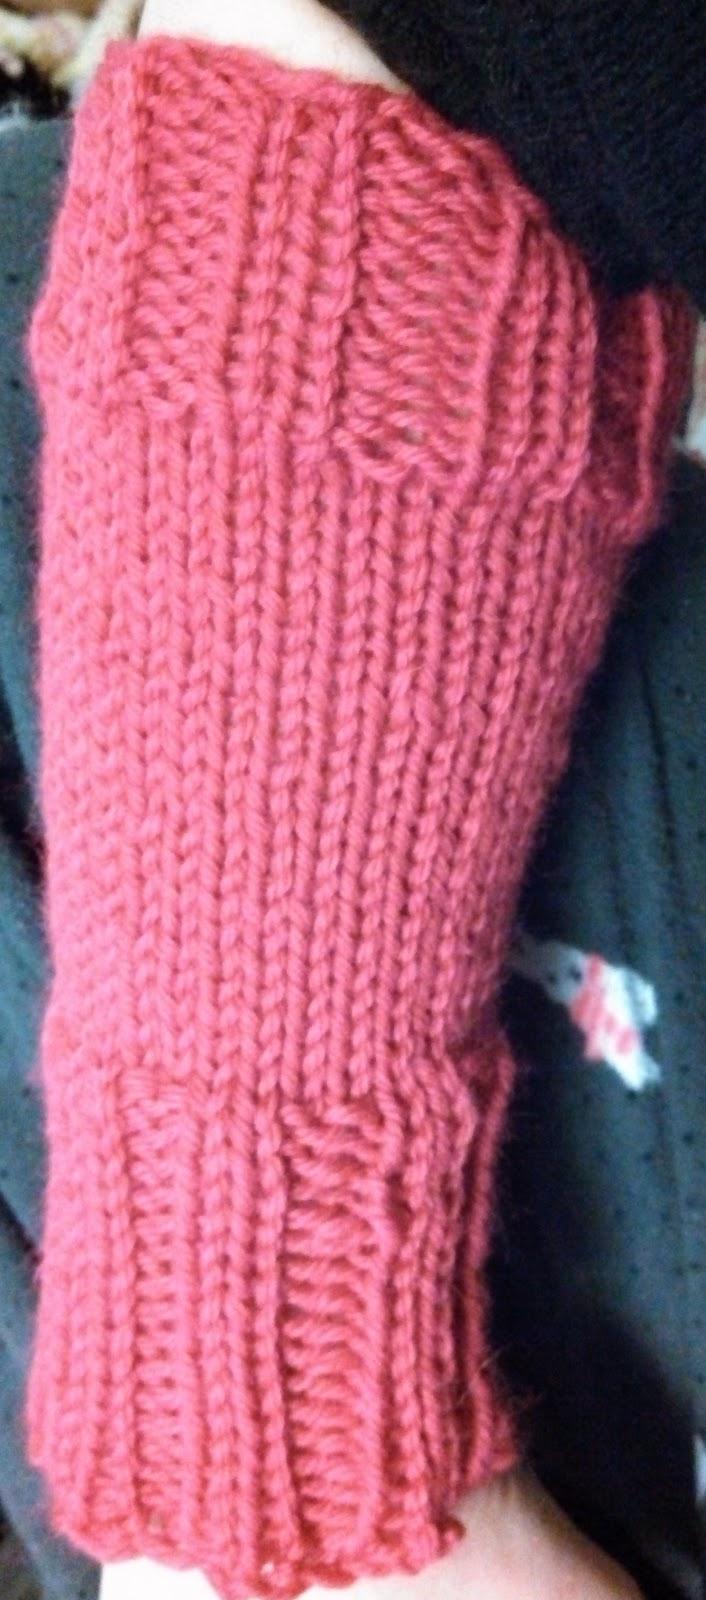 Knitting Patterns Mindful Meerkats